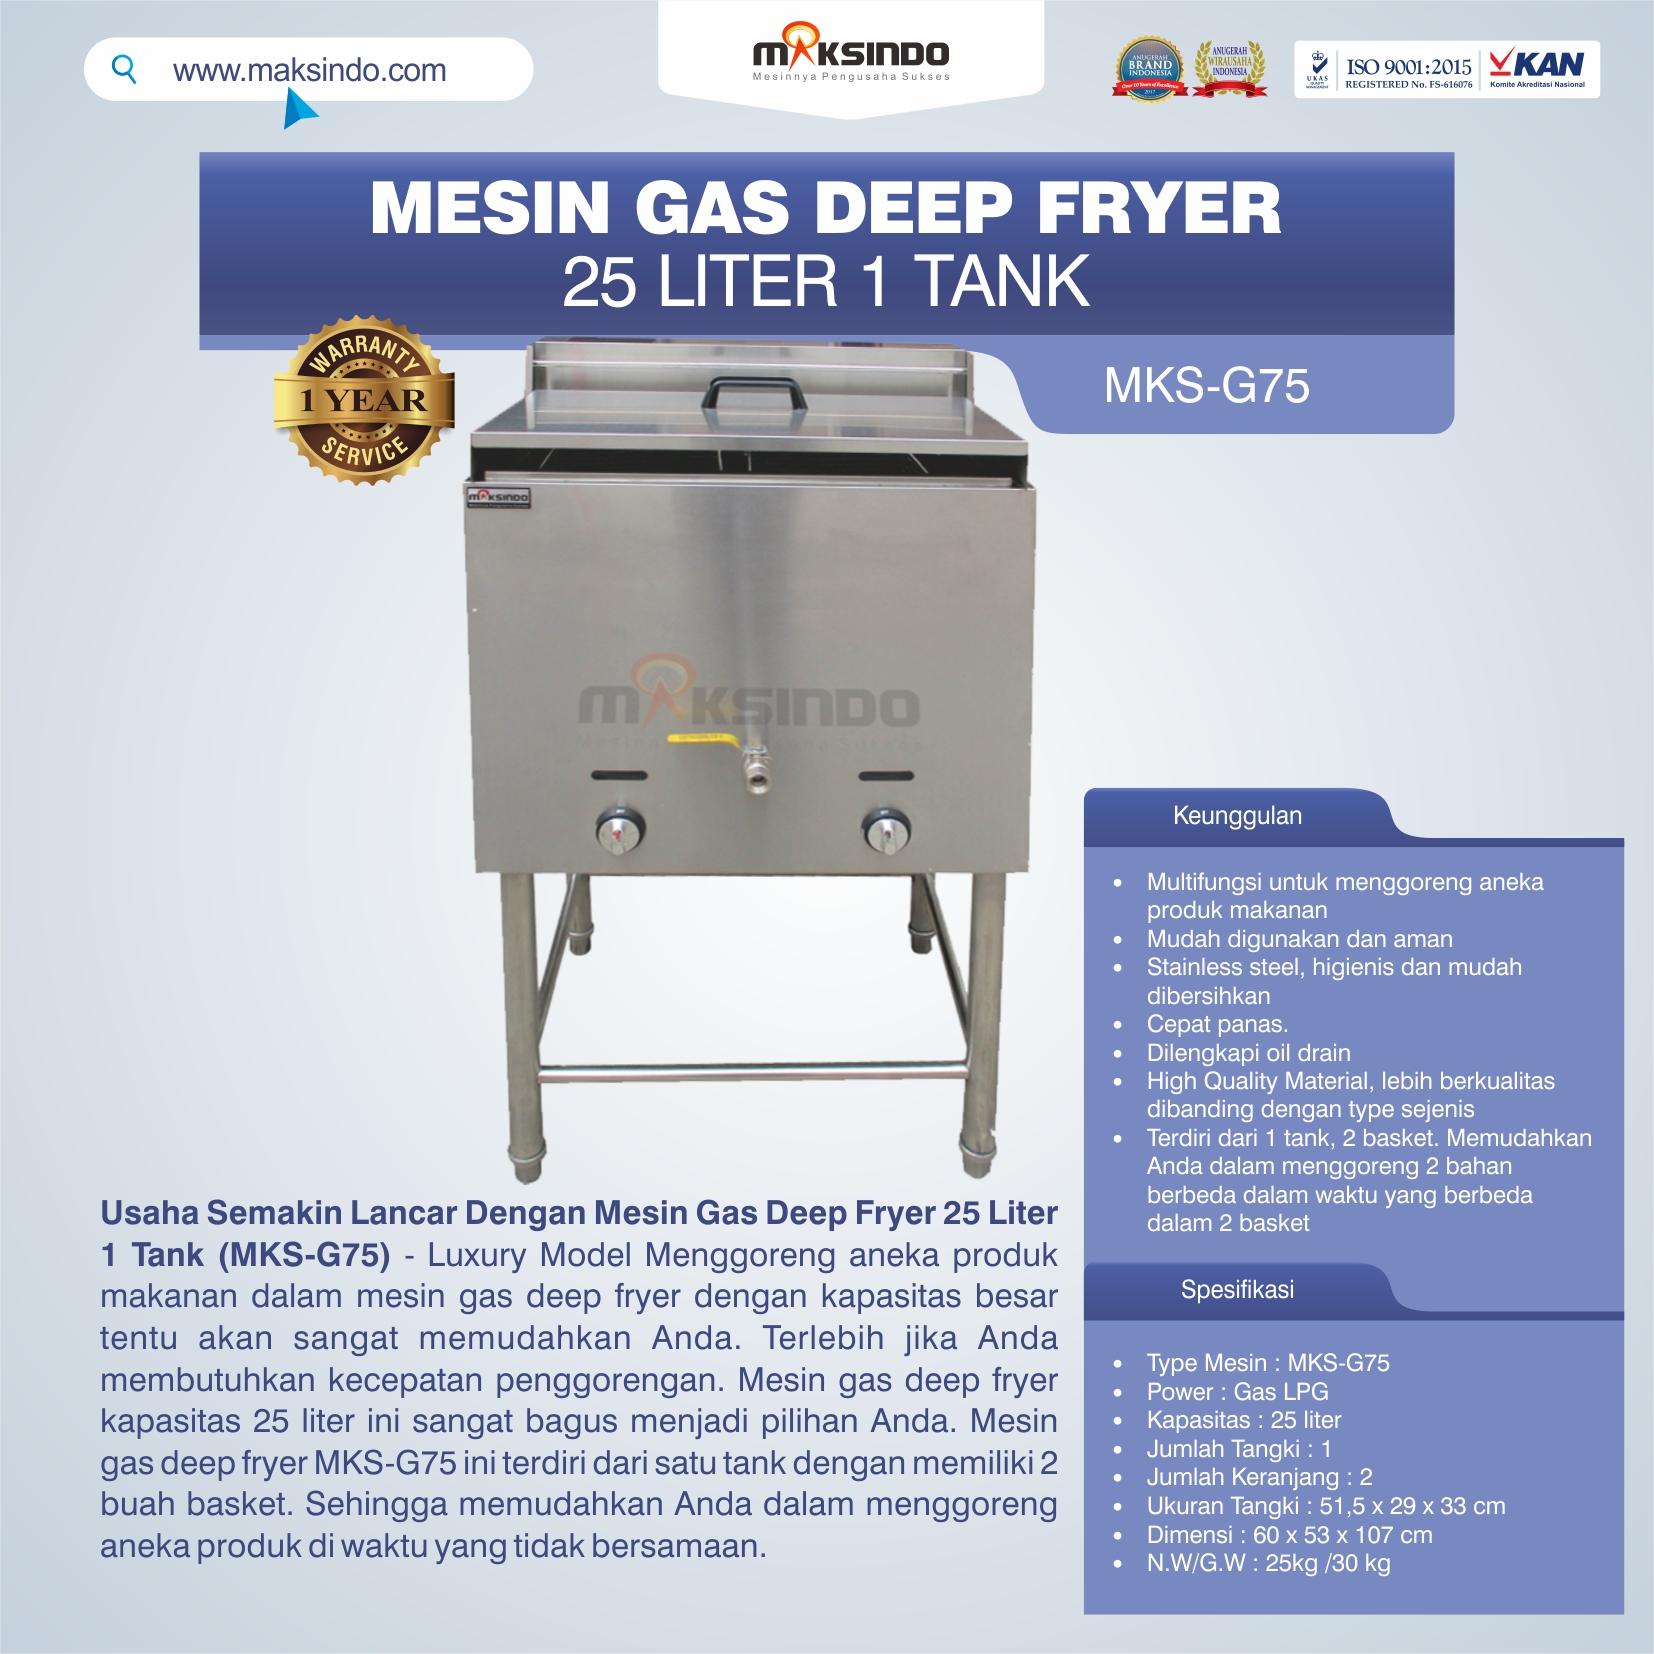 Jual Gas Deep Fryer 25 Liter 1 Tank (G75) di Pekanbaru